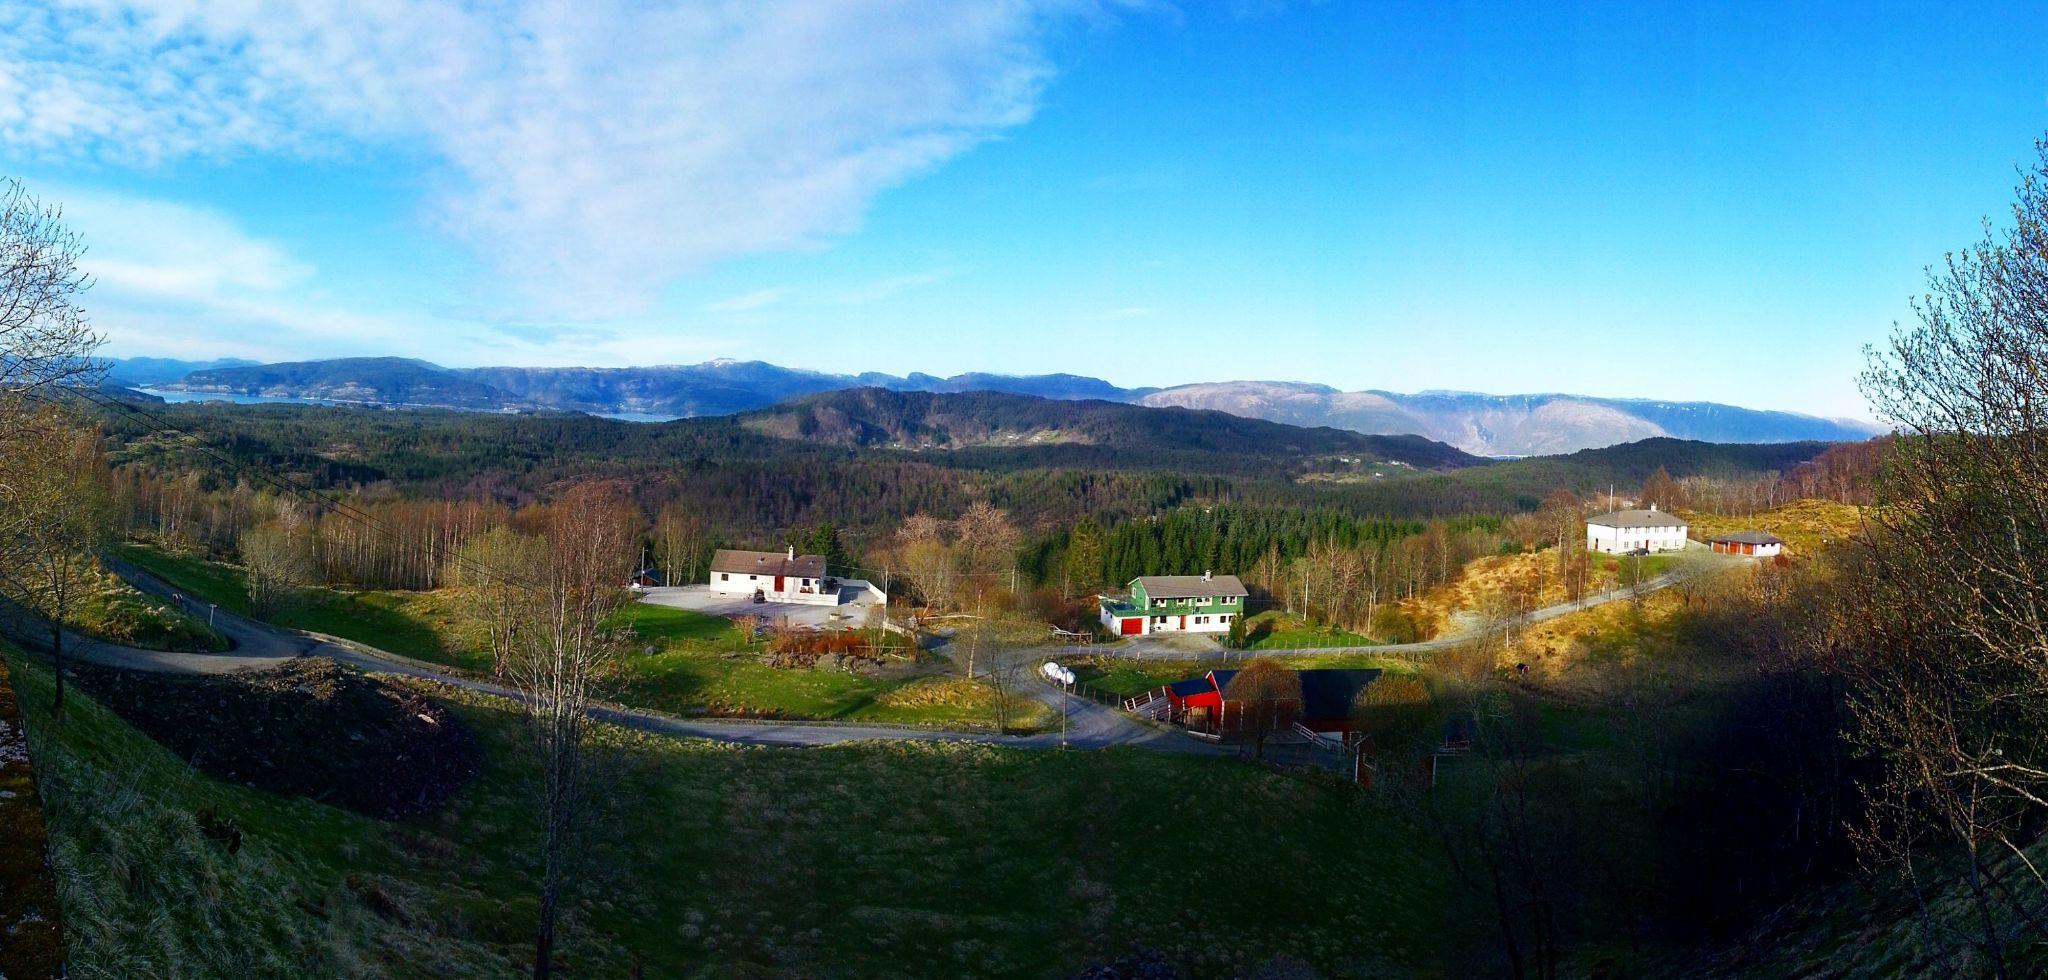 Birthplace by vidar.totland